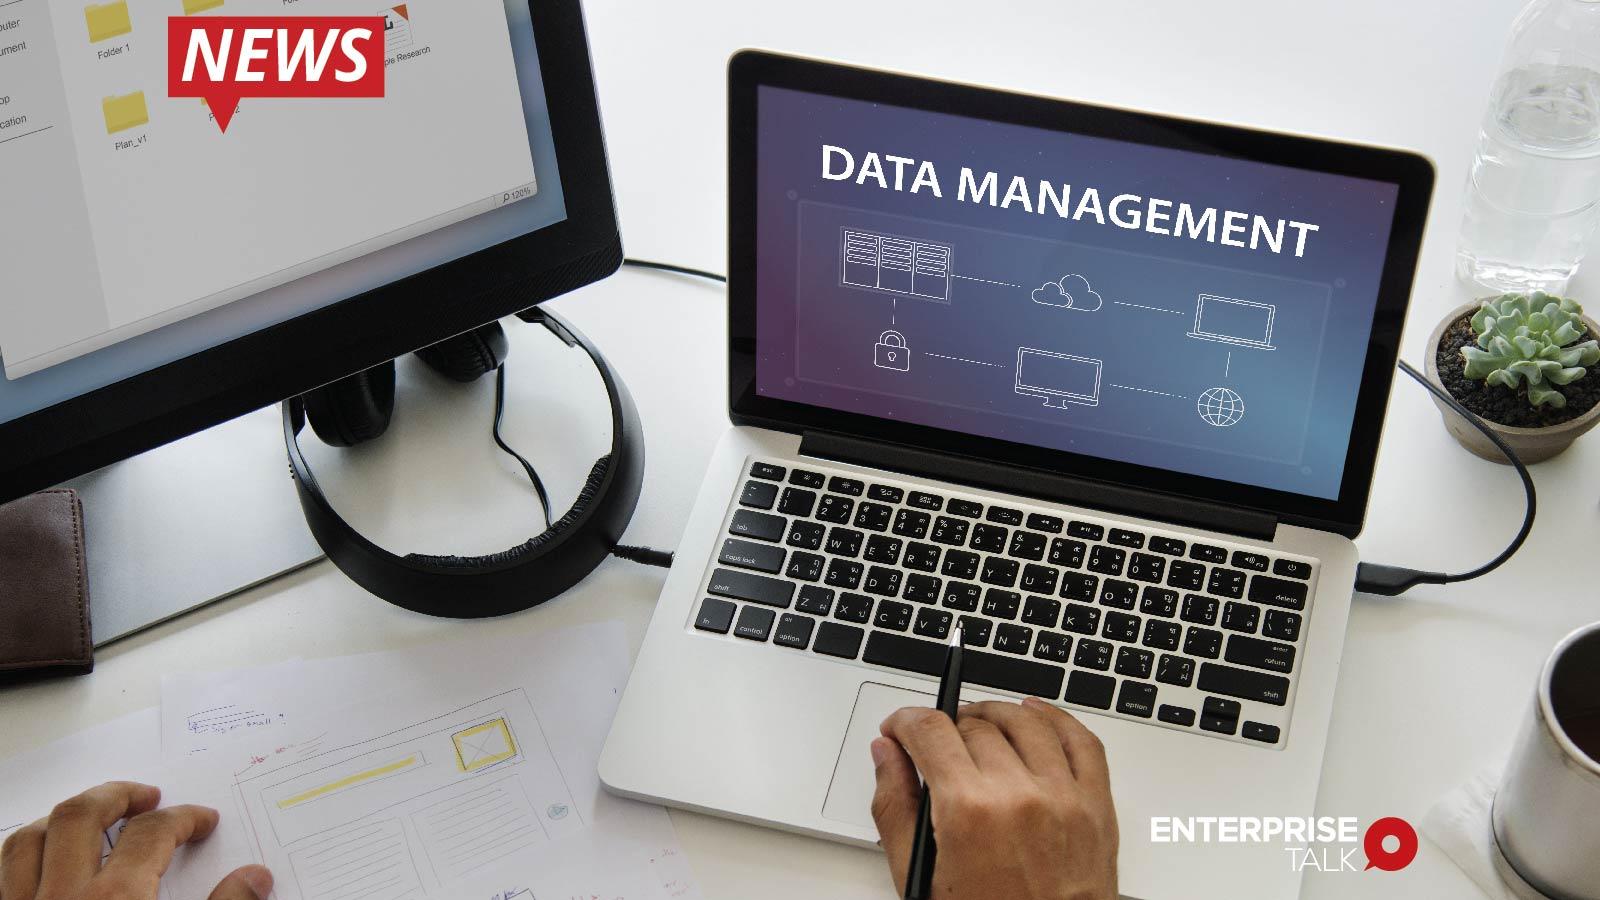 Bridging the Data Divide, Actifio's Cloud Data Management Accelerates Customers' DevOps, Analytics Initiatives